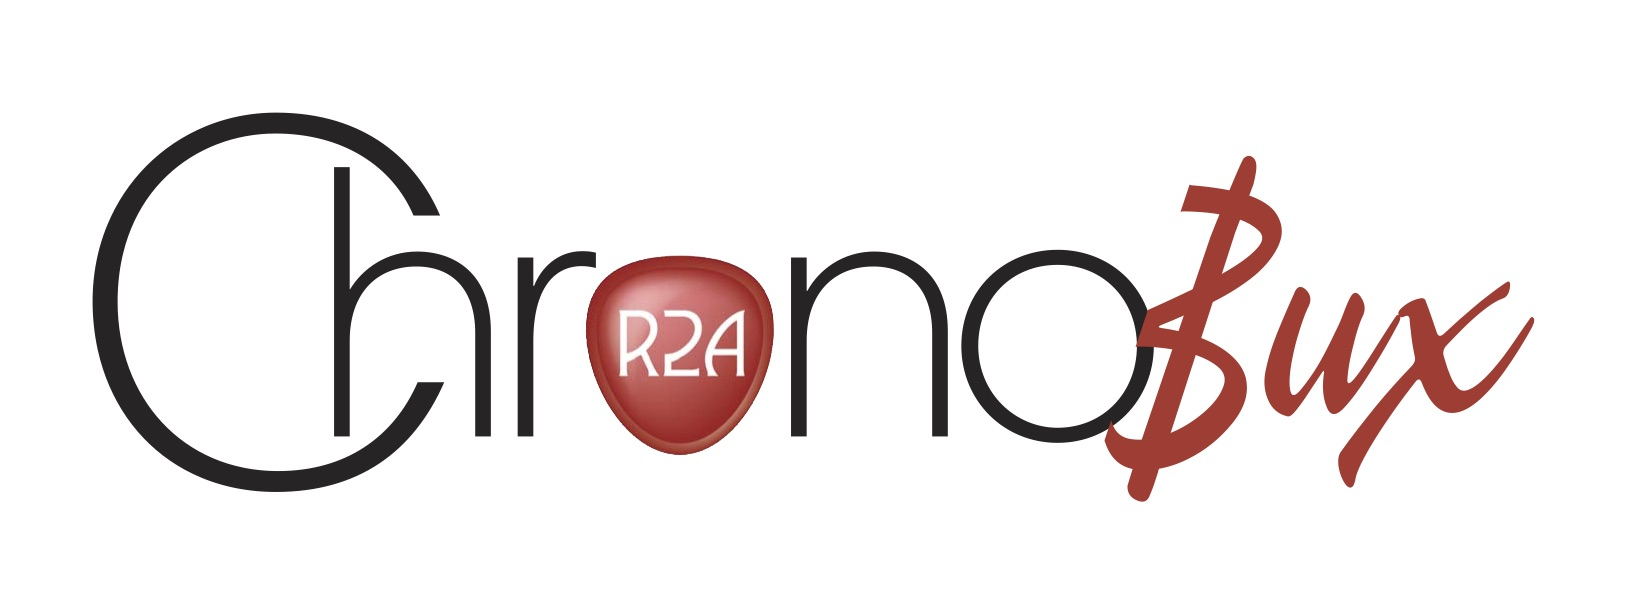 r2a-chronobux-logo-formerch.jpg